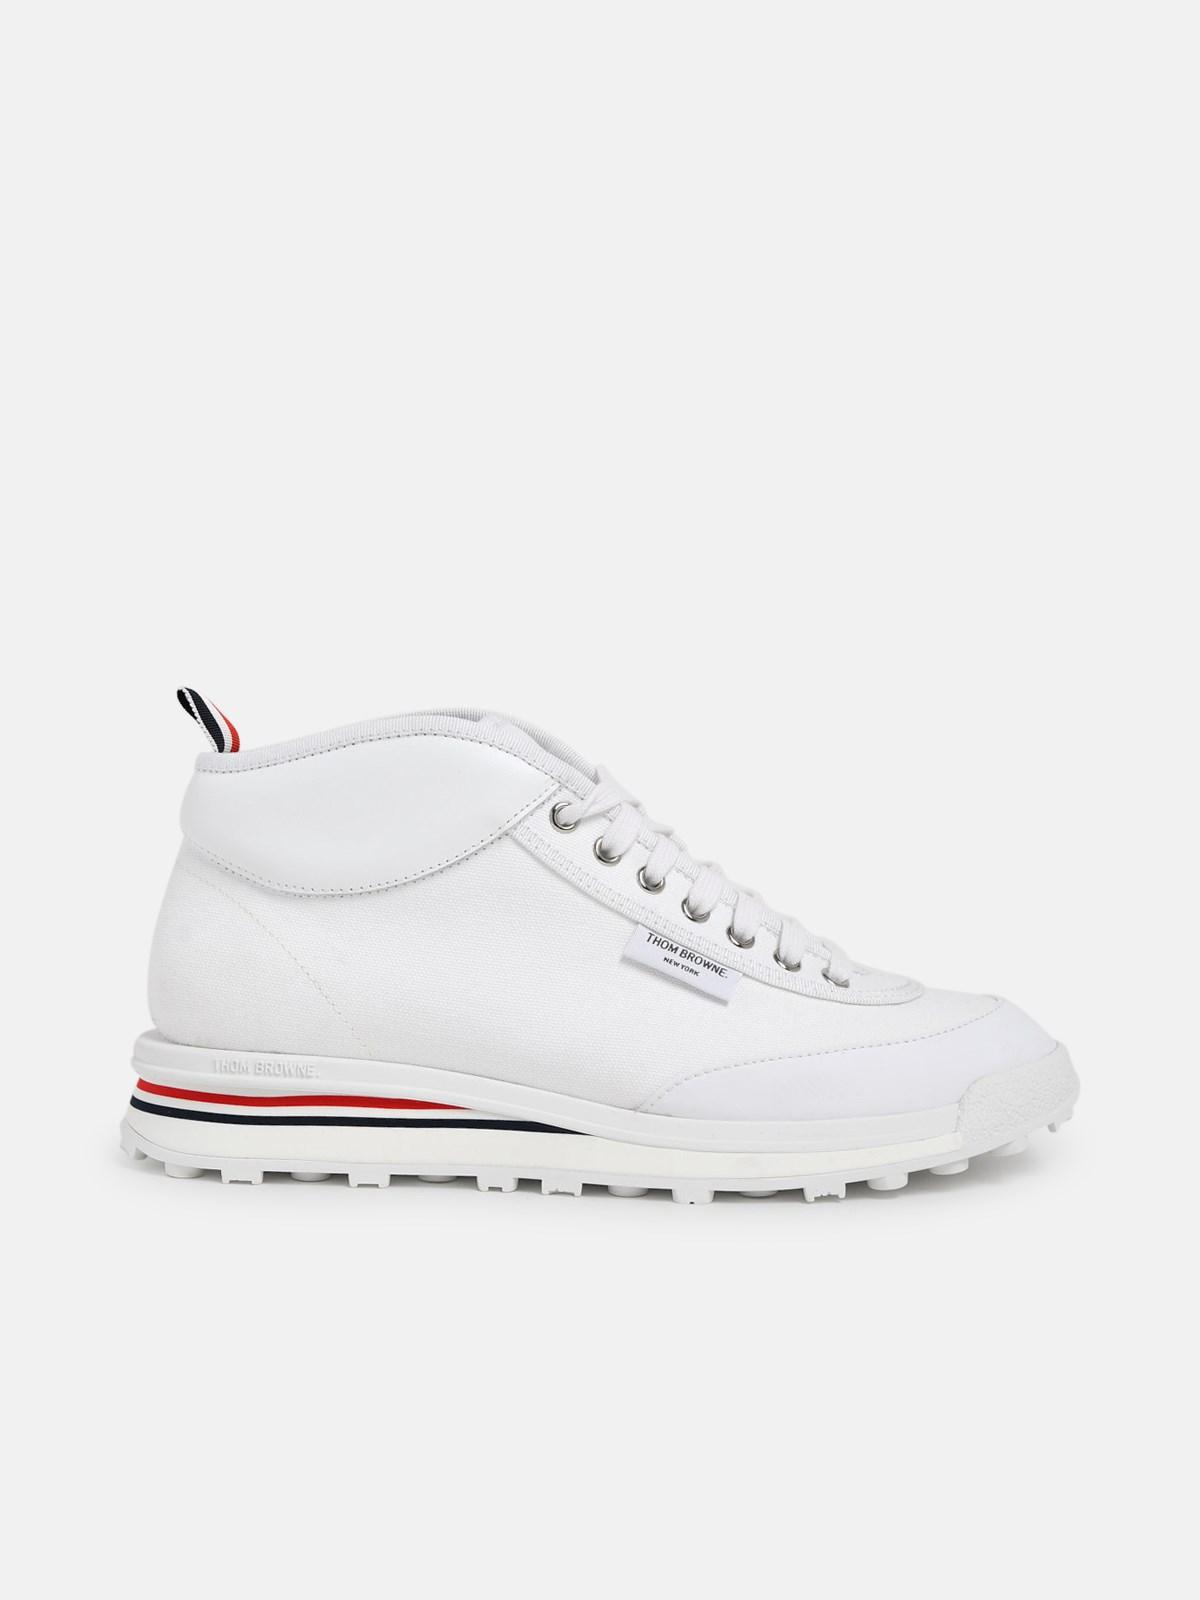 Thom Browne Shoes SNEAKER ALTA BIANCA